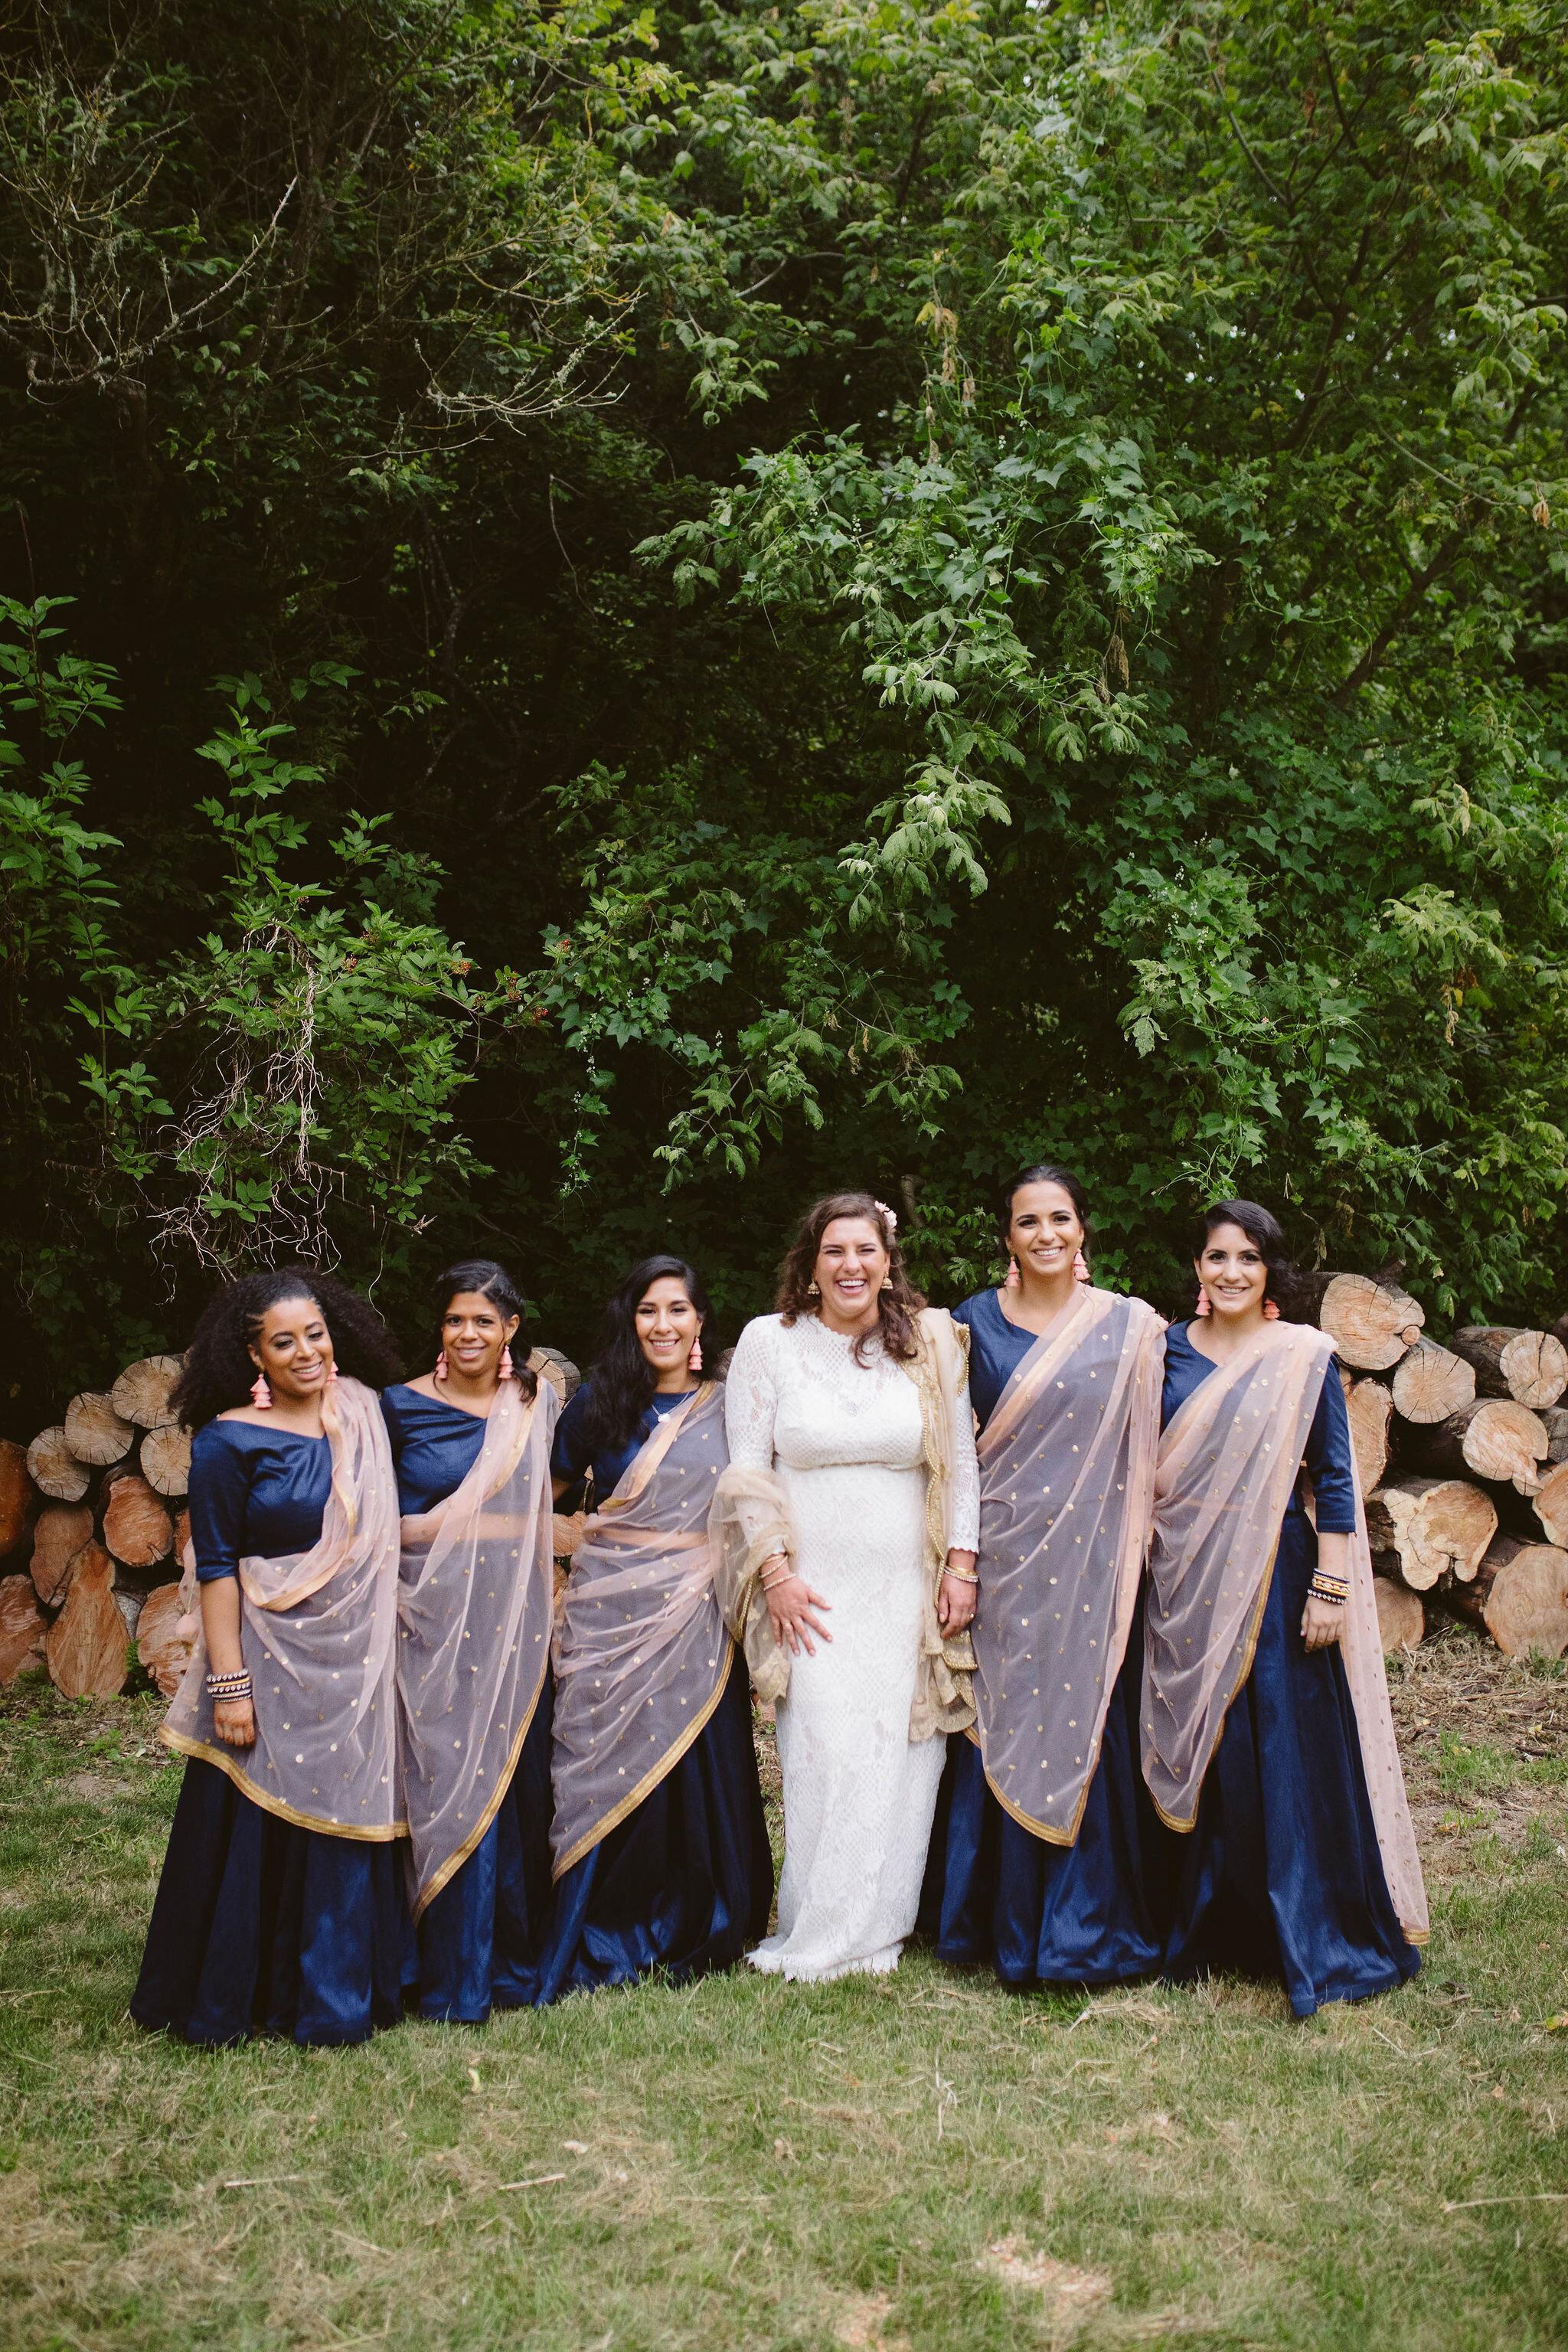 Venture-Retreat-Center-Wedding-Pescadero-Sat-Aaron-Pritam-The-Shalom-Imaginative-769.jpg